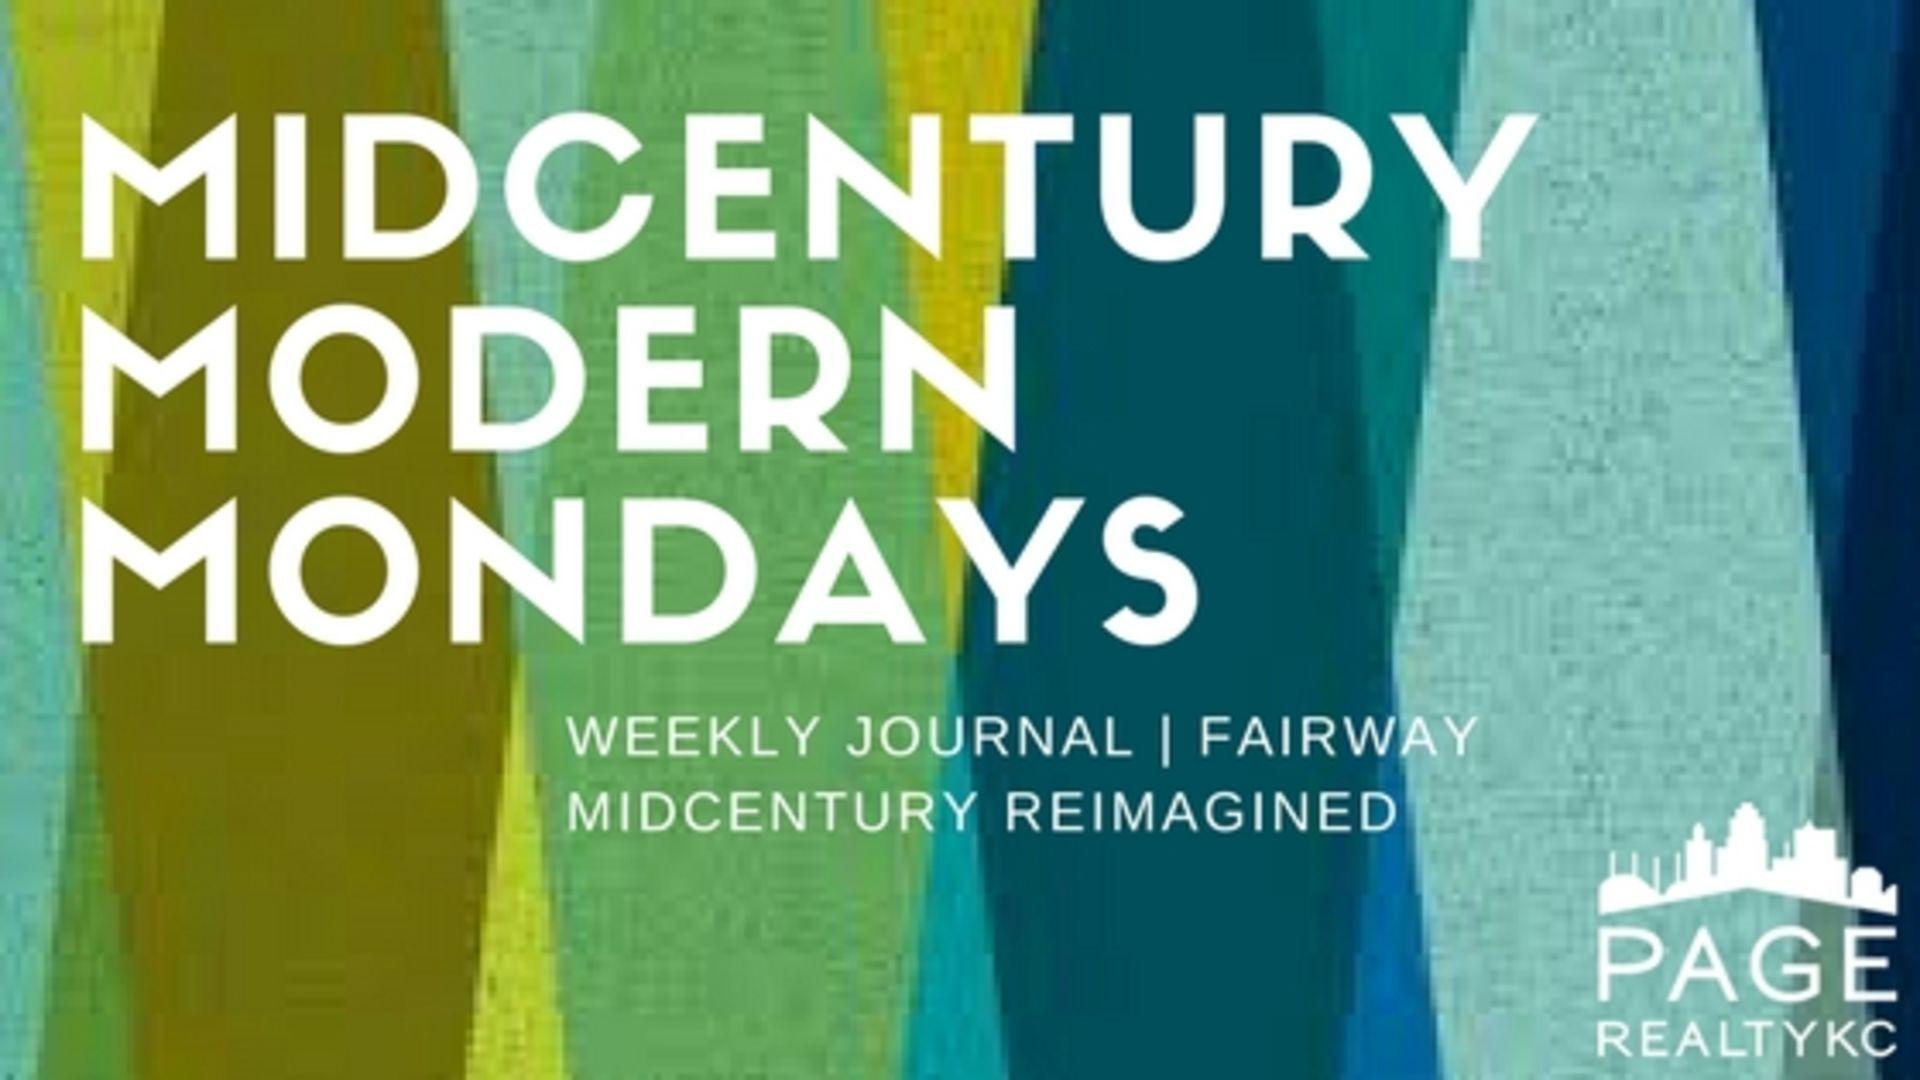 Midcentury Modern Monday July 10th